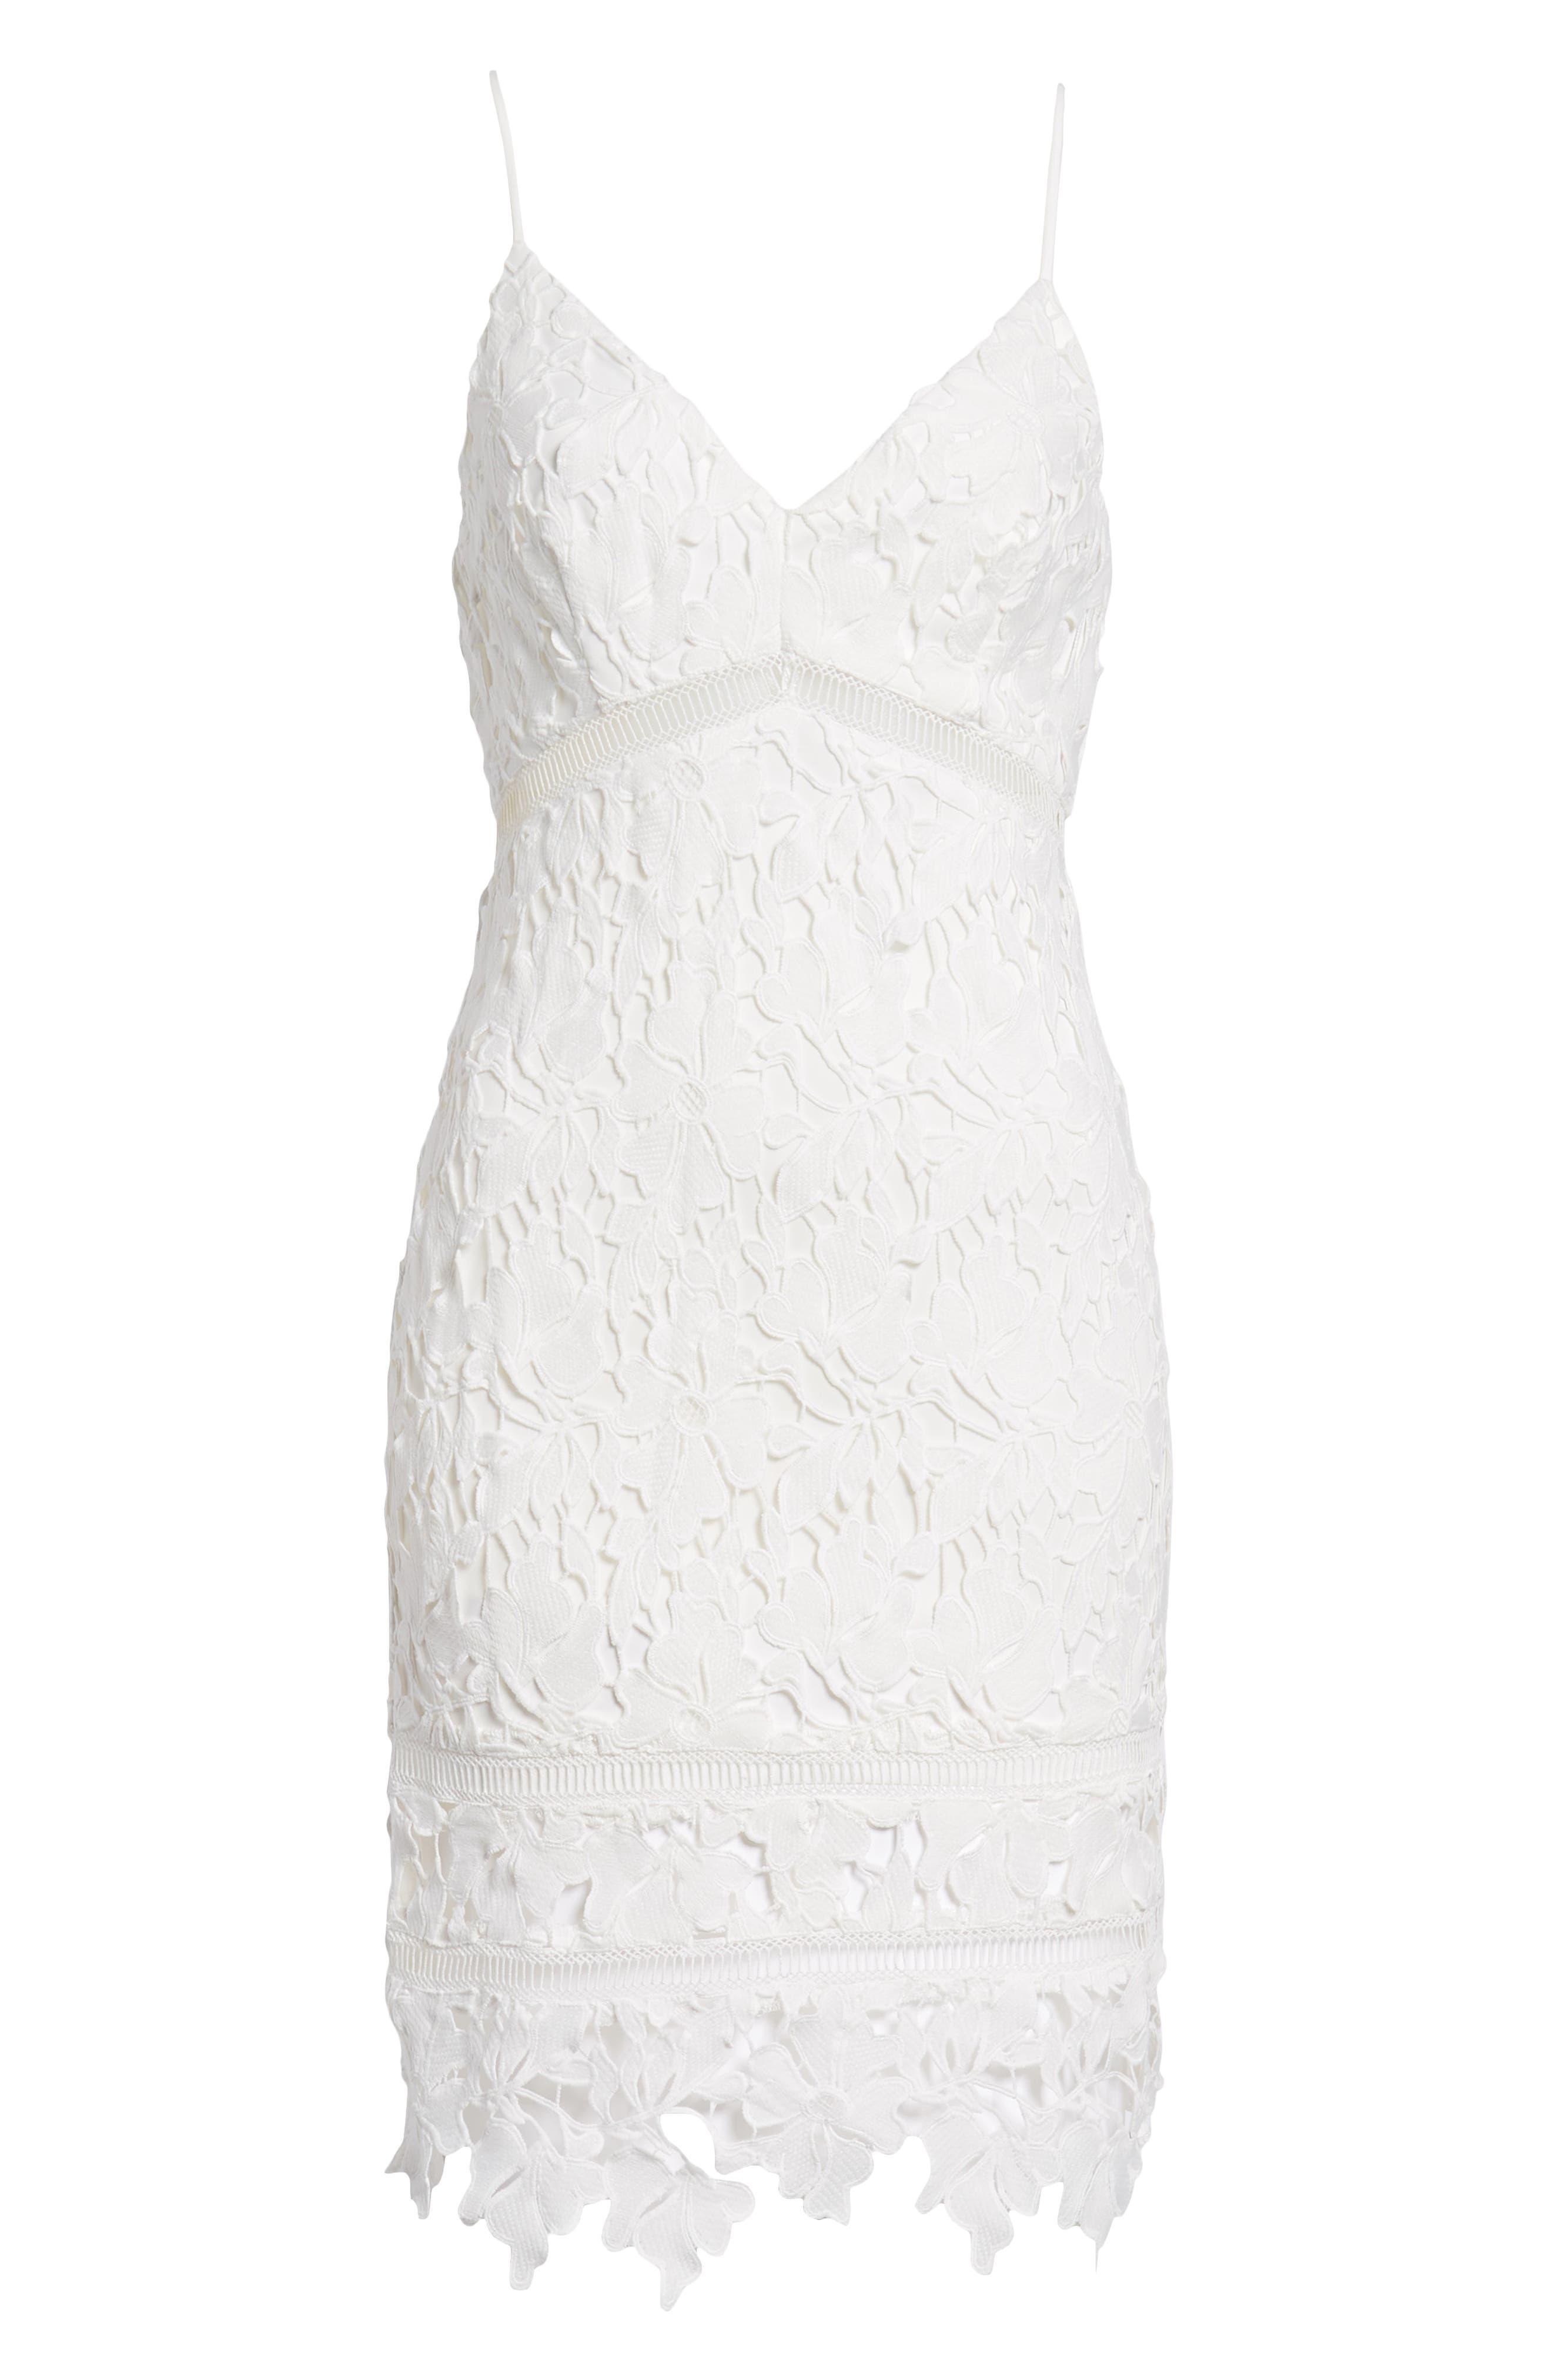 ASTR THE LABEL, ASTR Lace Bodycon Dress, Alternate thumbnail 7, color, WHITE